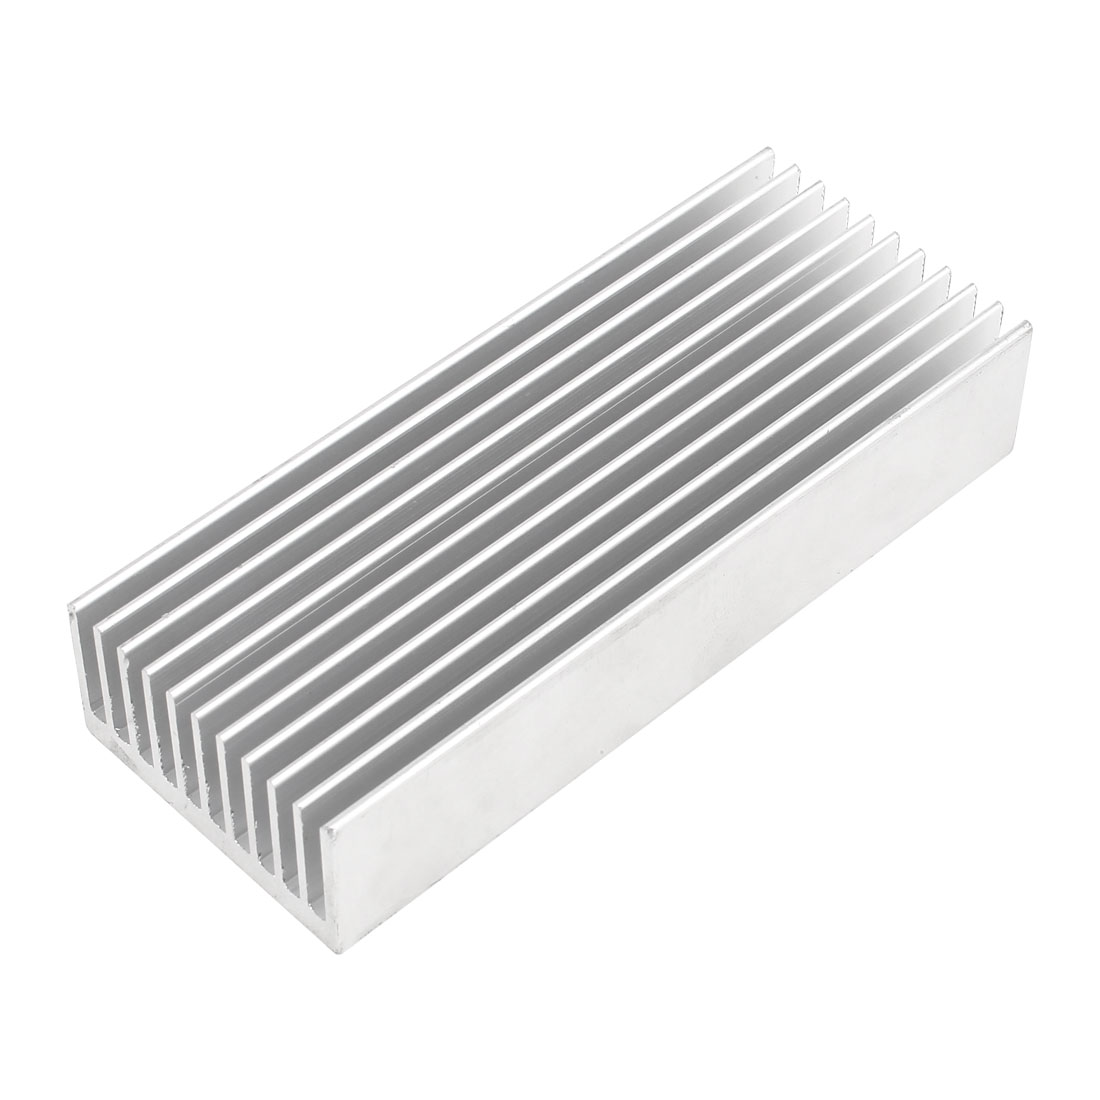 Silver Tone Aluminum Cooler Radiator Heat Sink Heatsink 100mm x 40mm x 20mm